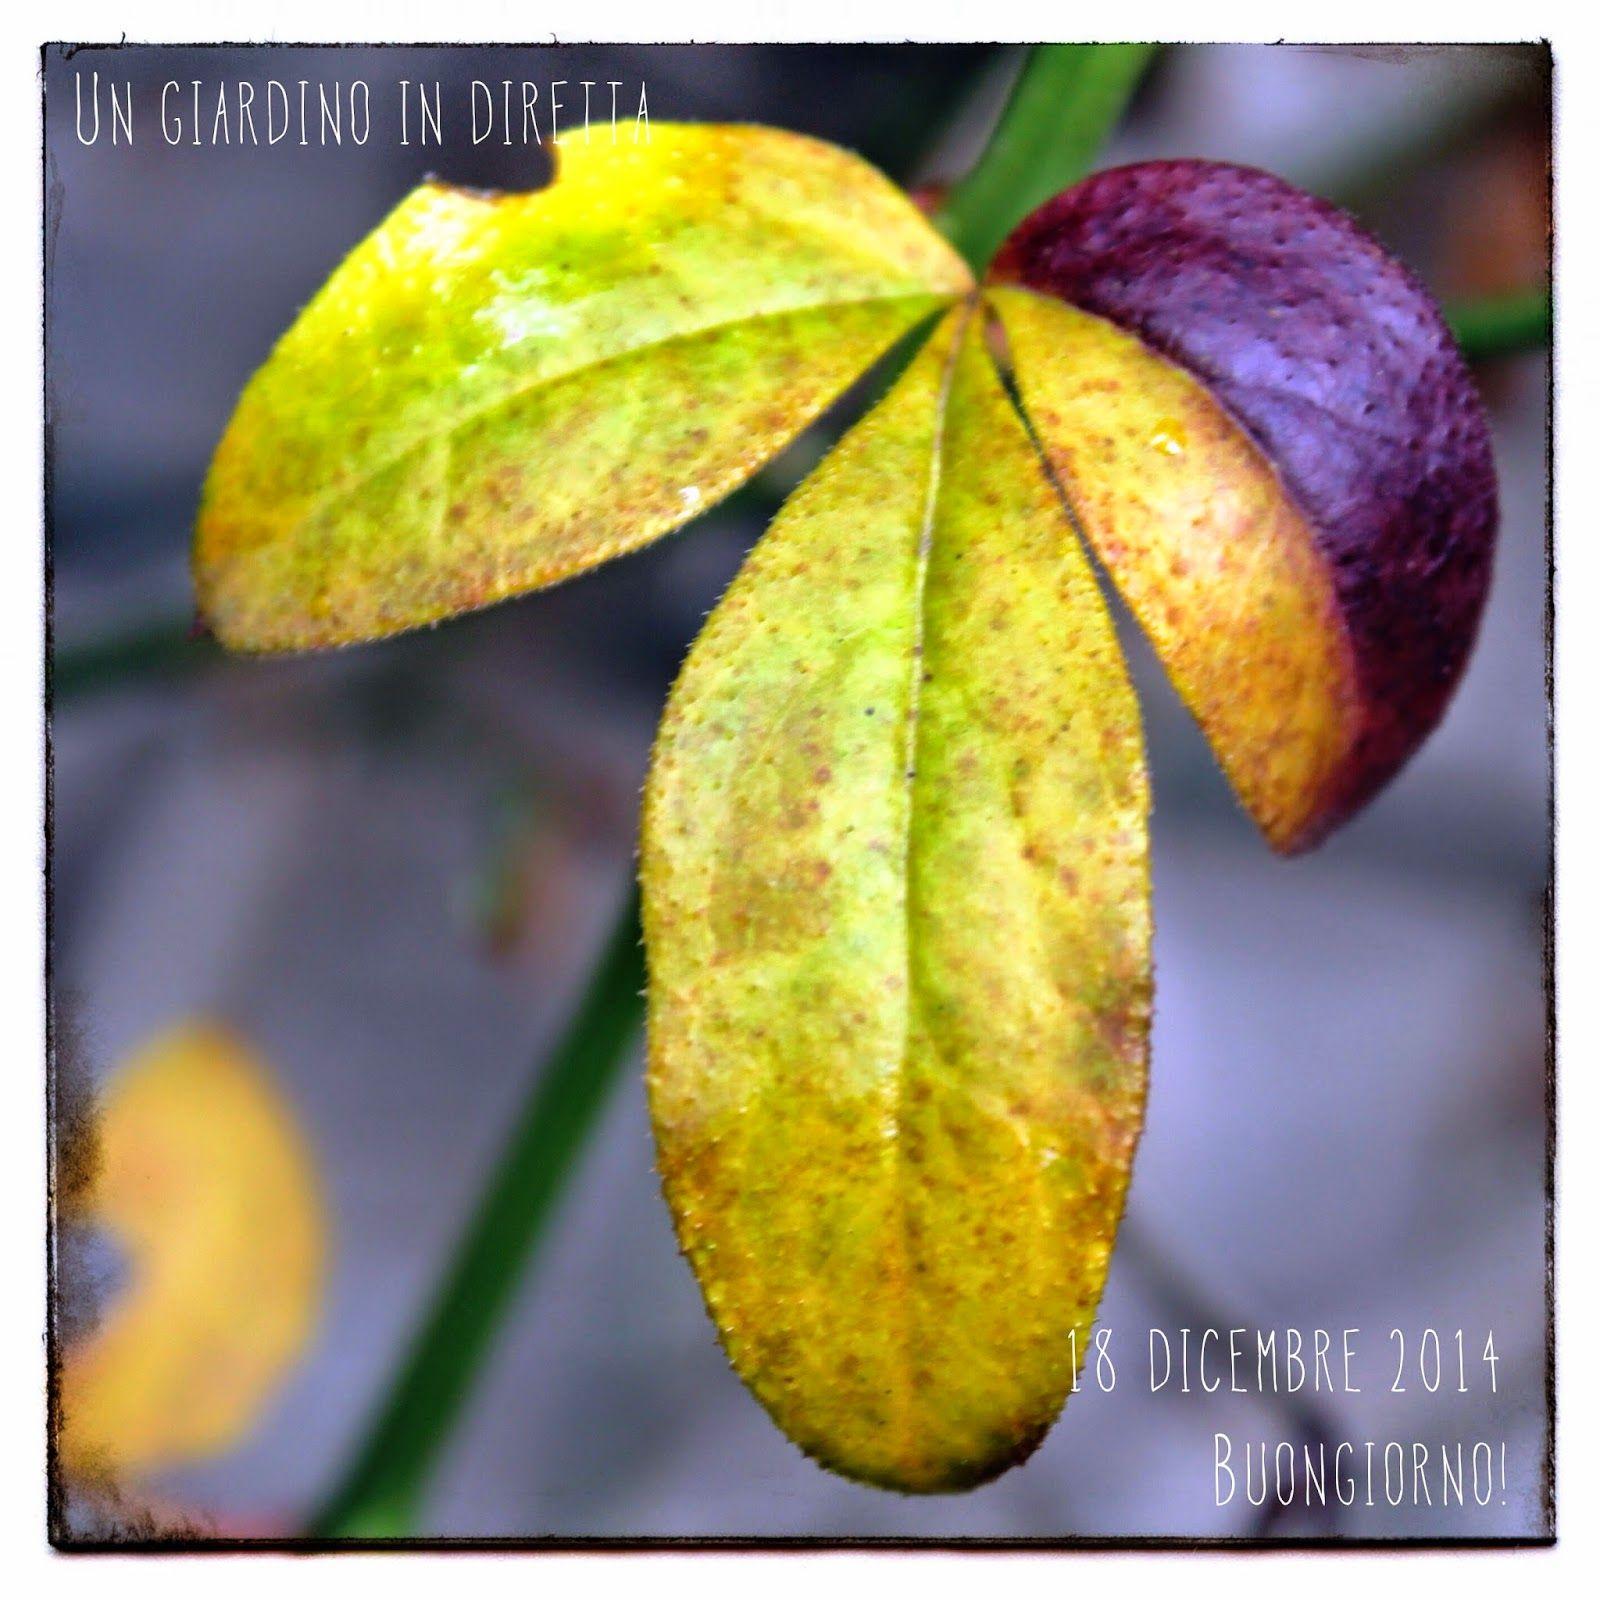 in diretta dal giardino: le ultime foglie del gelsomino d'inverno (Jasminum nudiflorum), buongiorno giardinieri! #giardino #giardinoindiretta #foglie